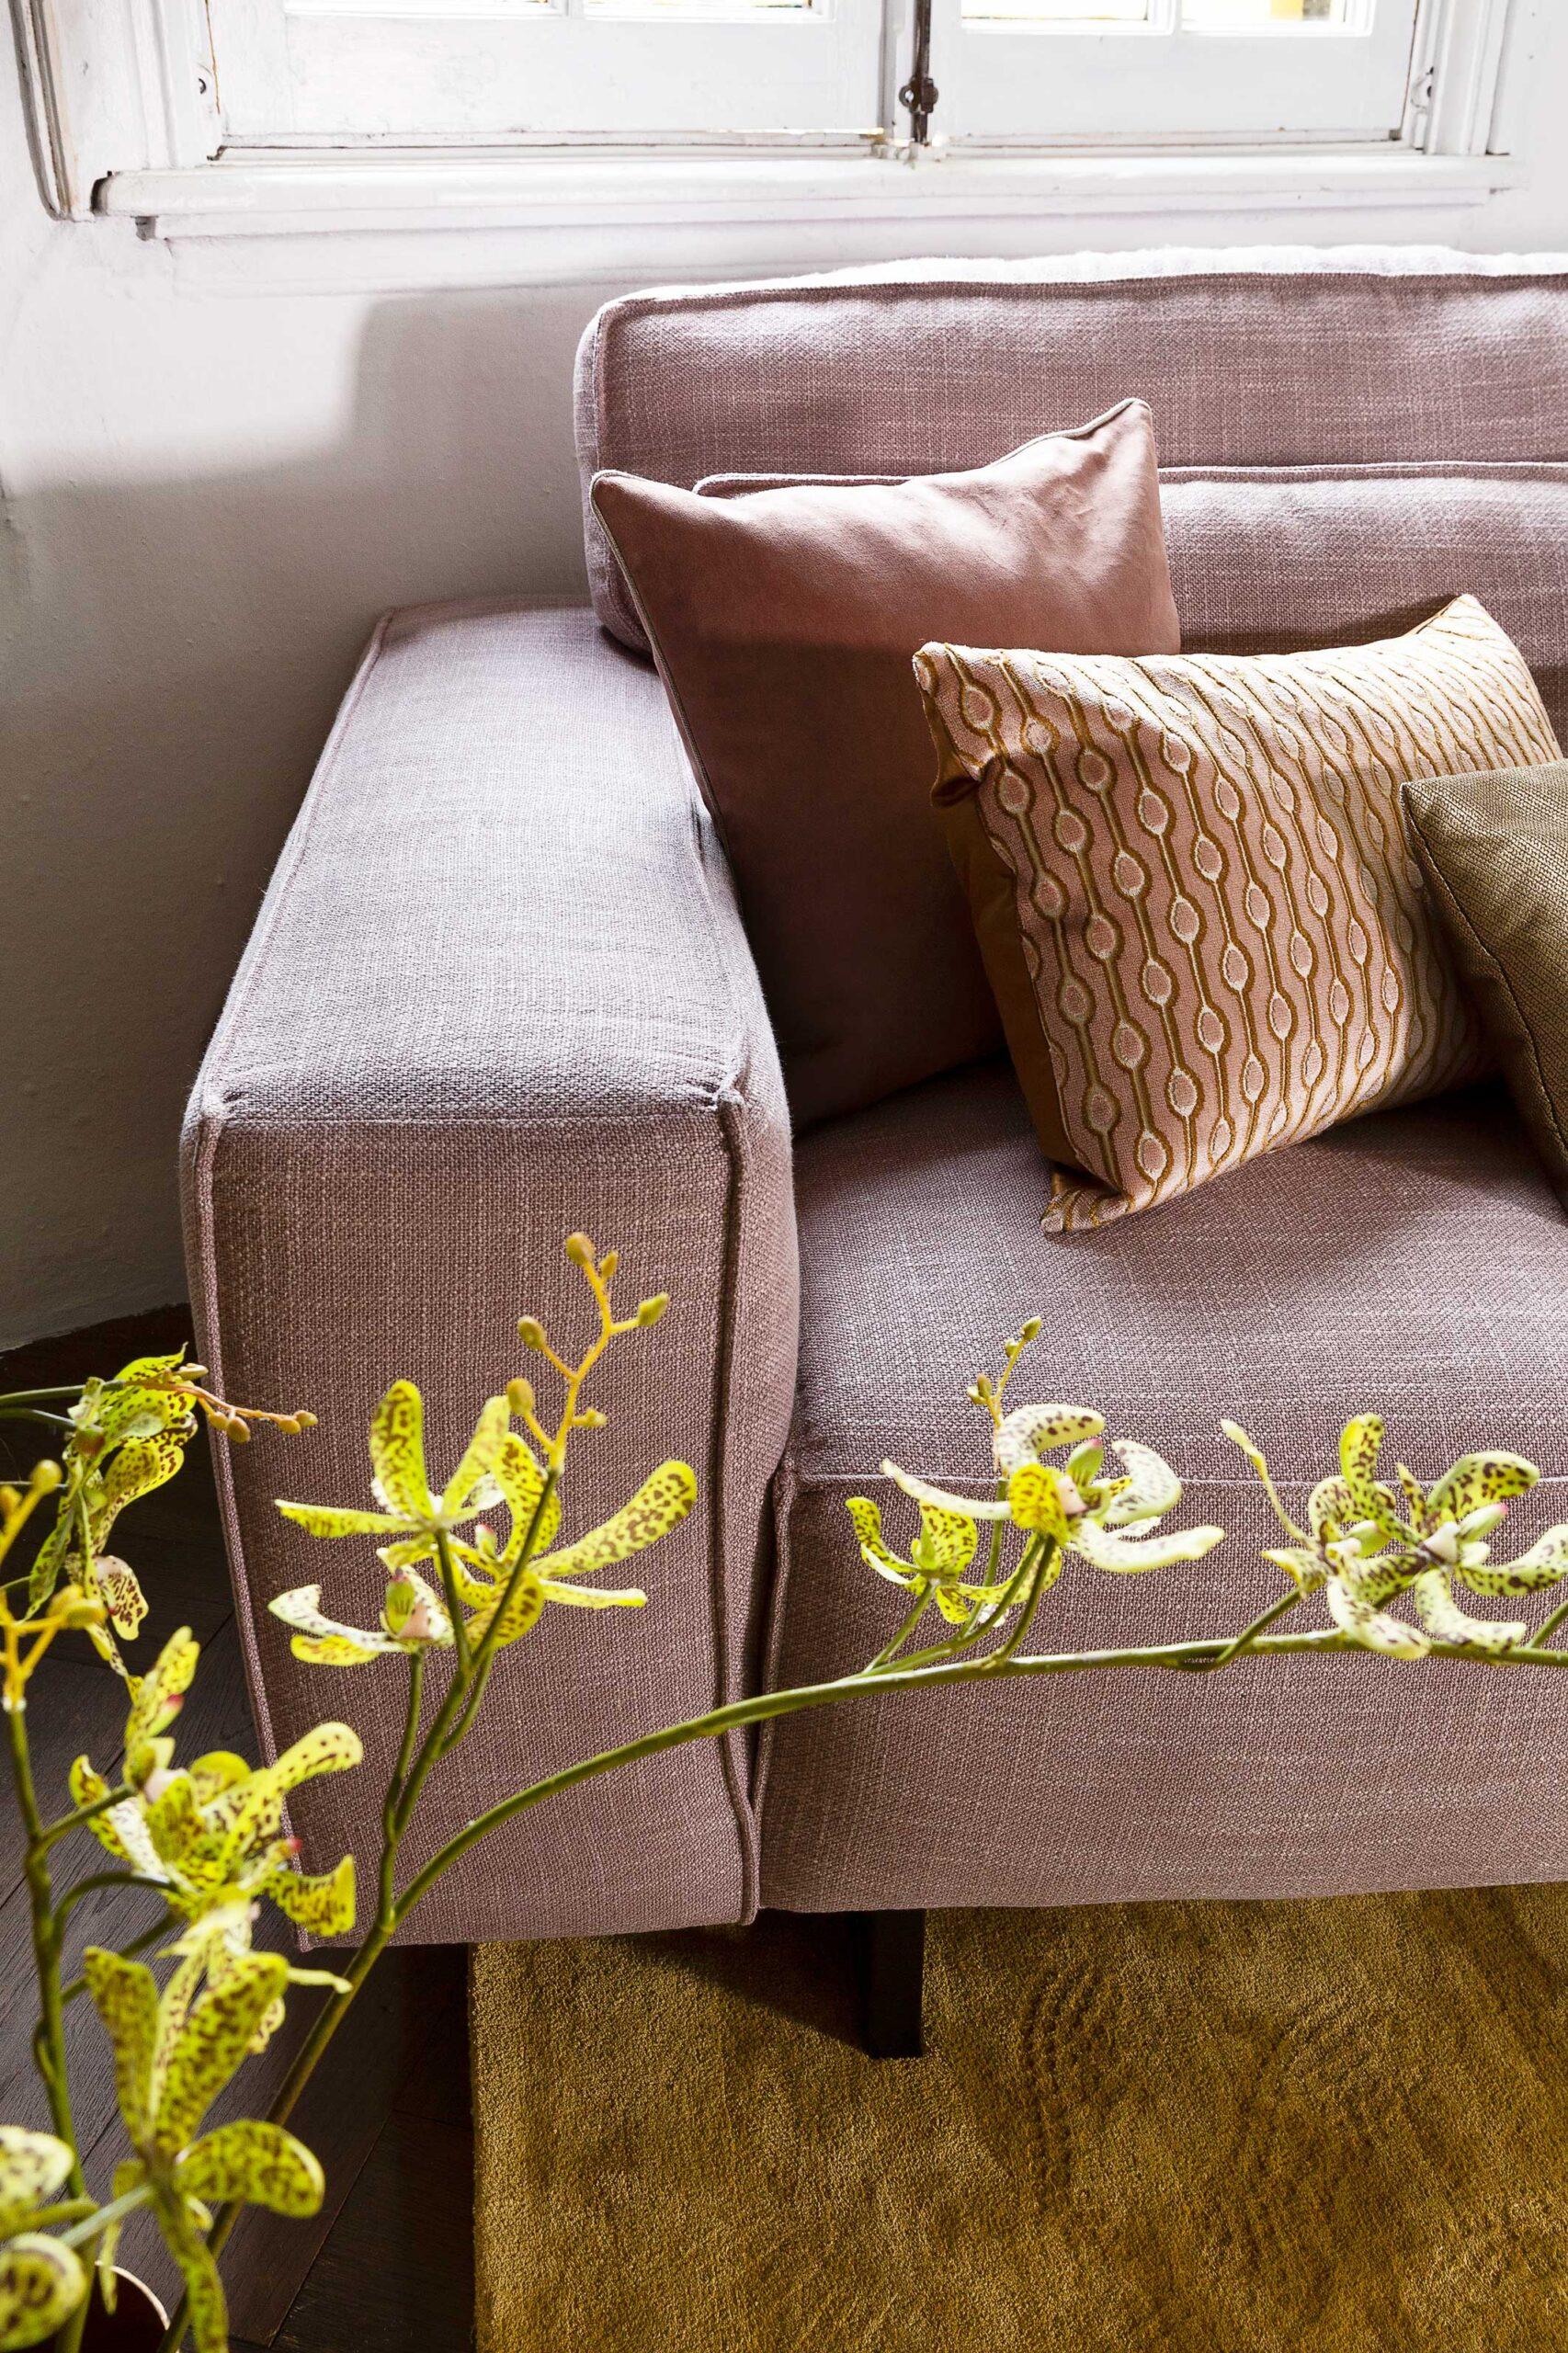 vivre-de-provence-hoekbank-detail-armleuning-soofs-interieur